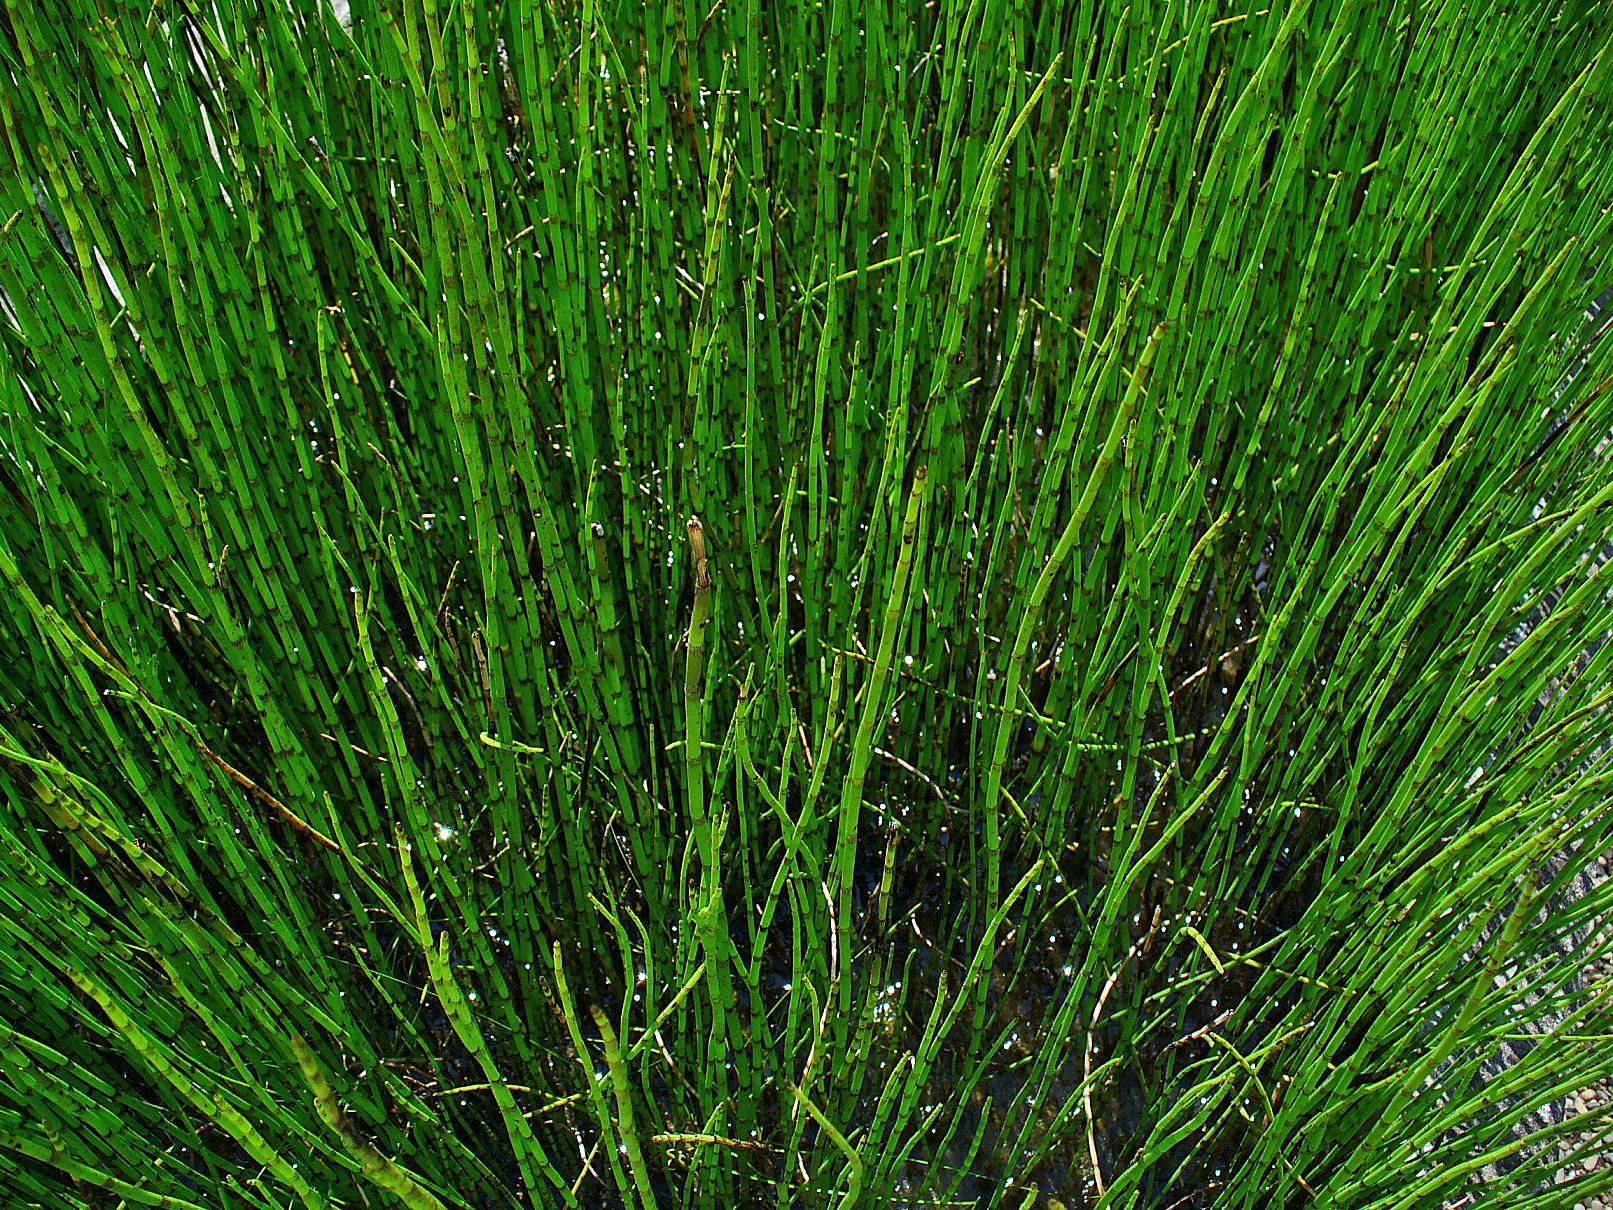 File:Equisetum fluviatile 001.JPG - Wikimedia Commons